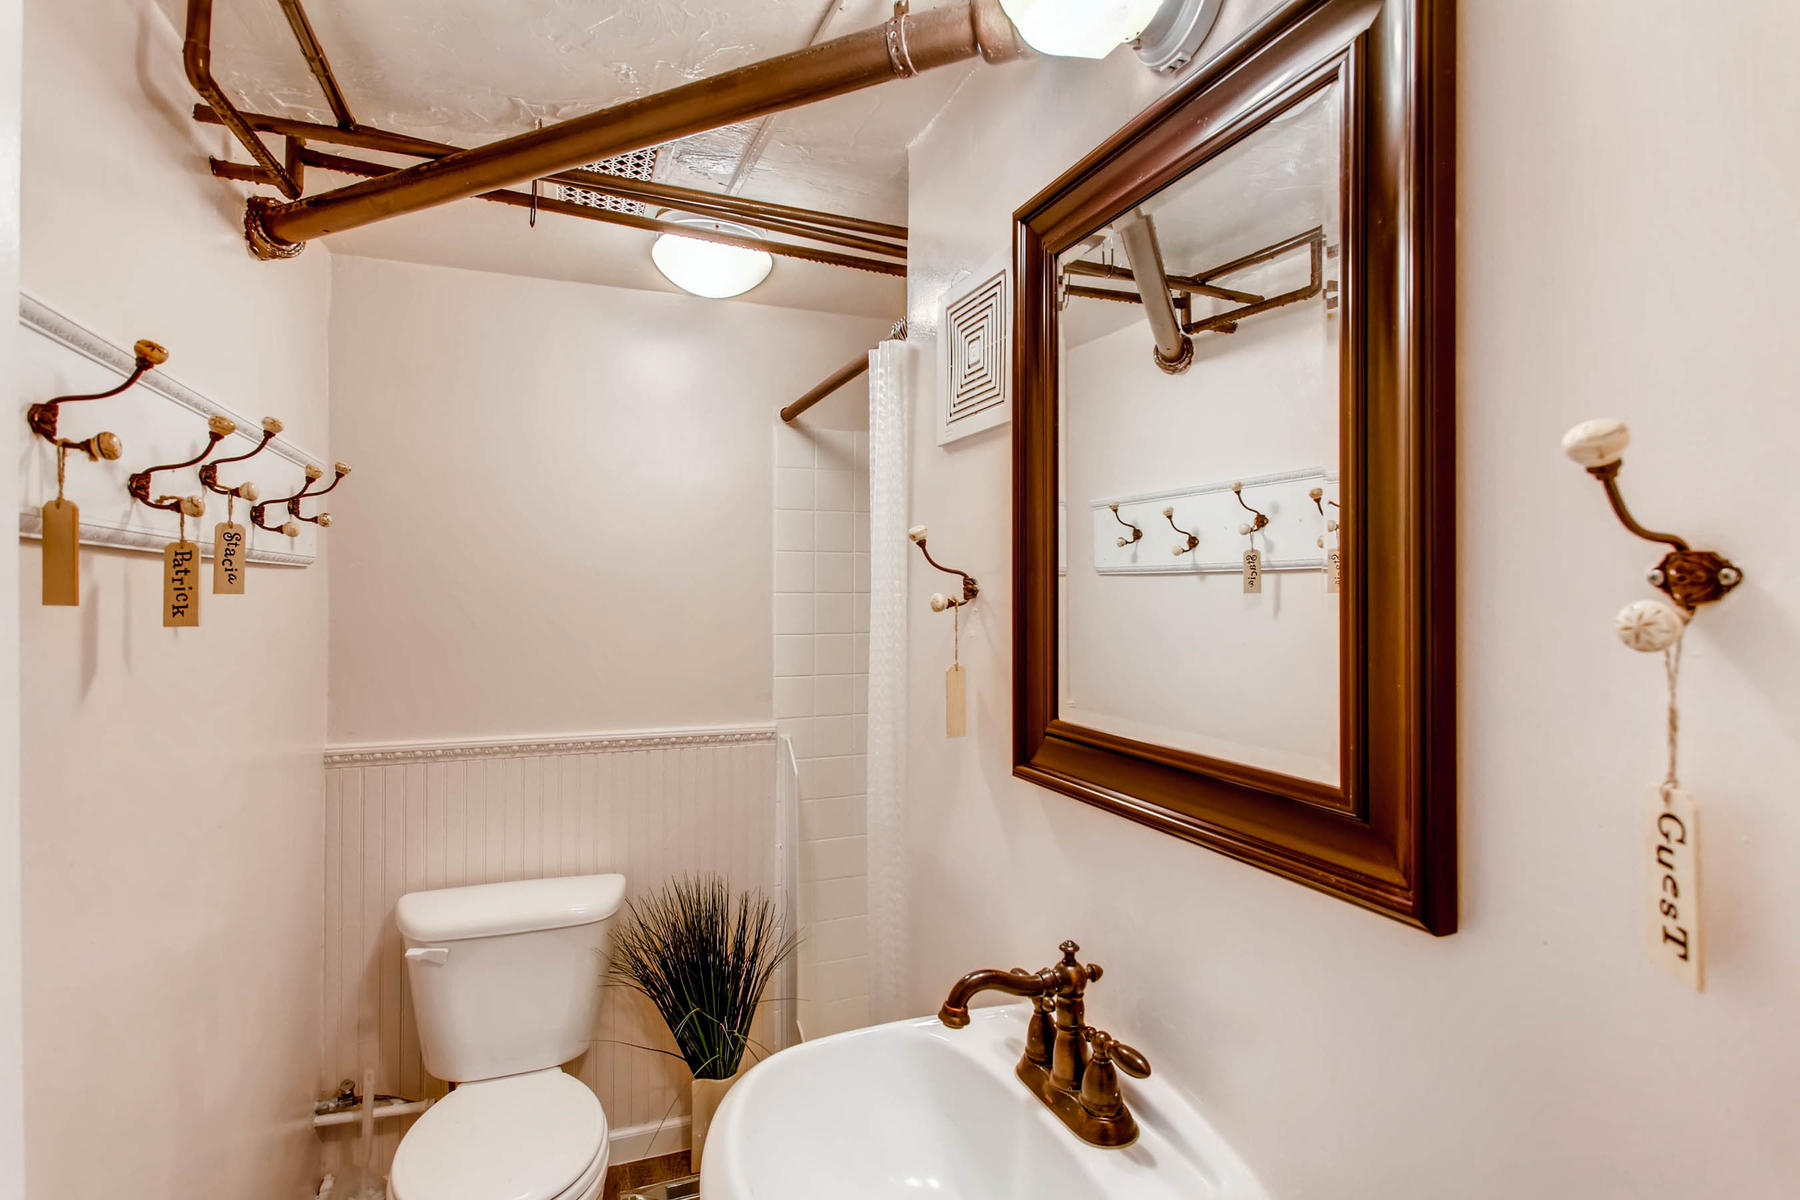 1737 W Powers Ave Littleton CO-MLS_Size-020-7-Lower Level Bathroom-1800x1200-72dpi.jpg